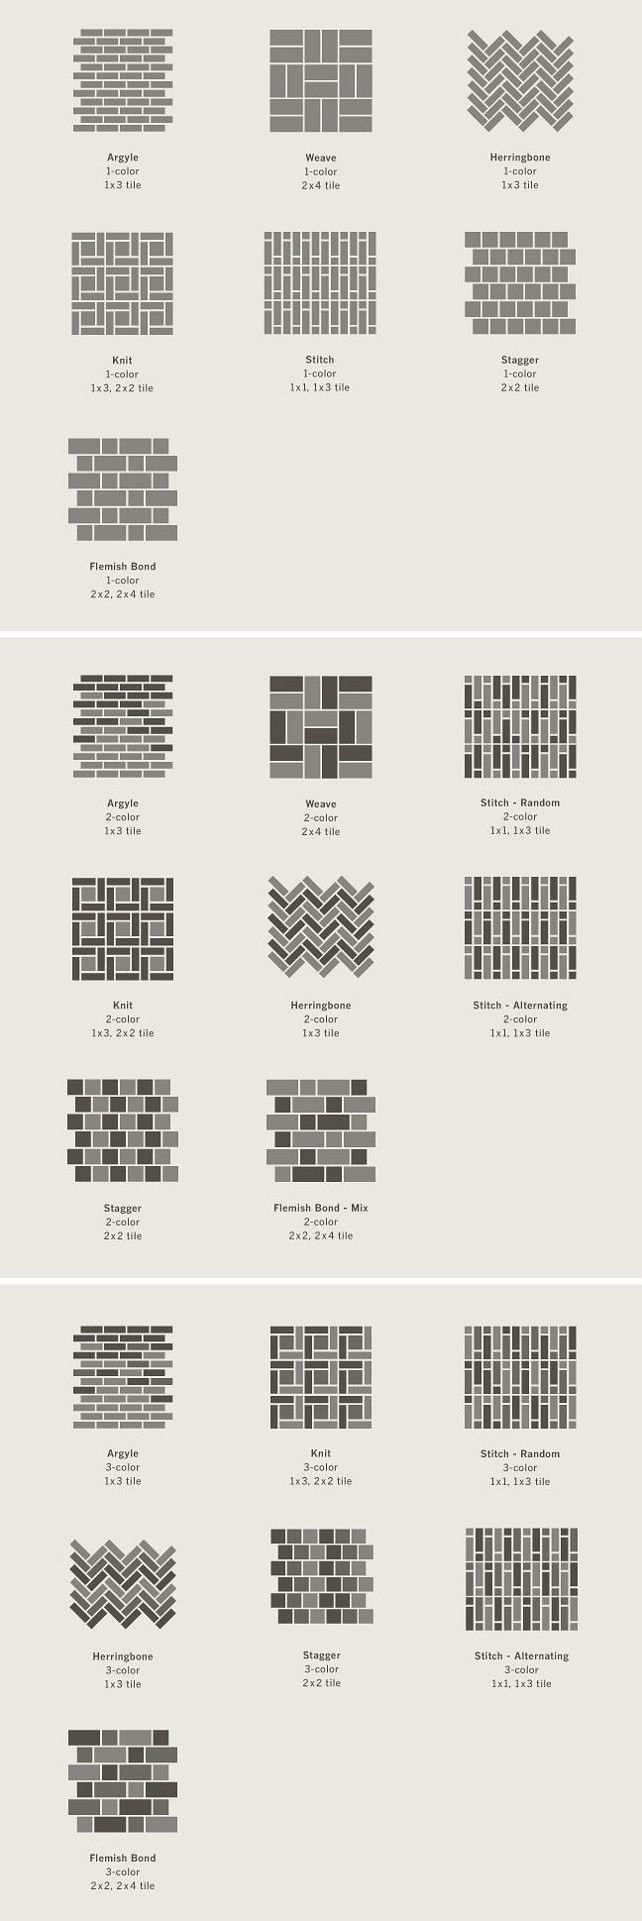 Interior Design Ideas: Tile Backsplash Design.